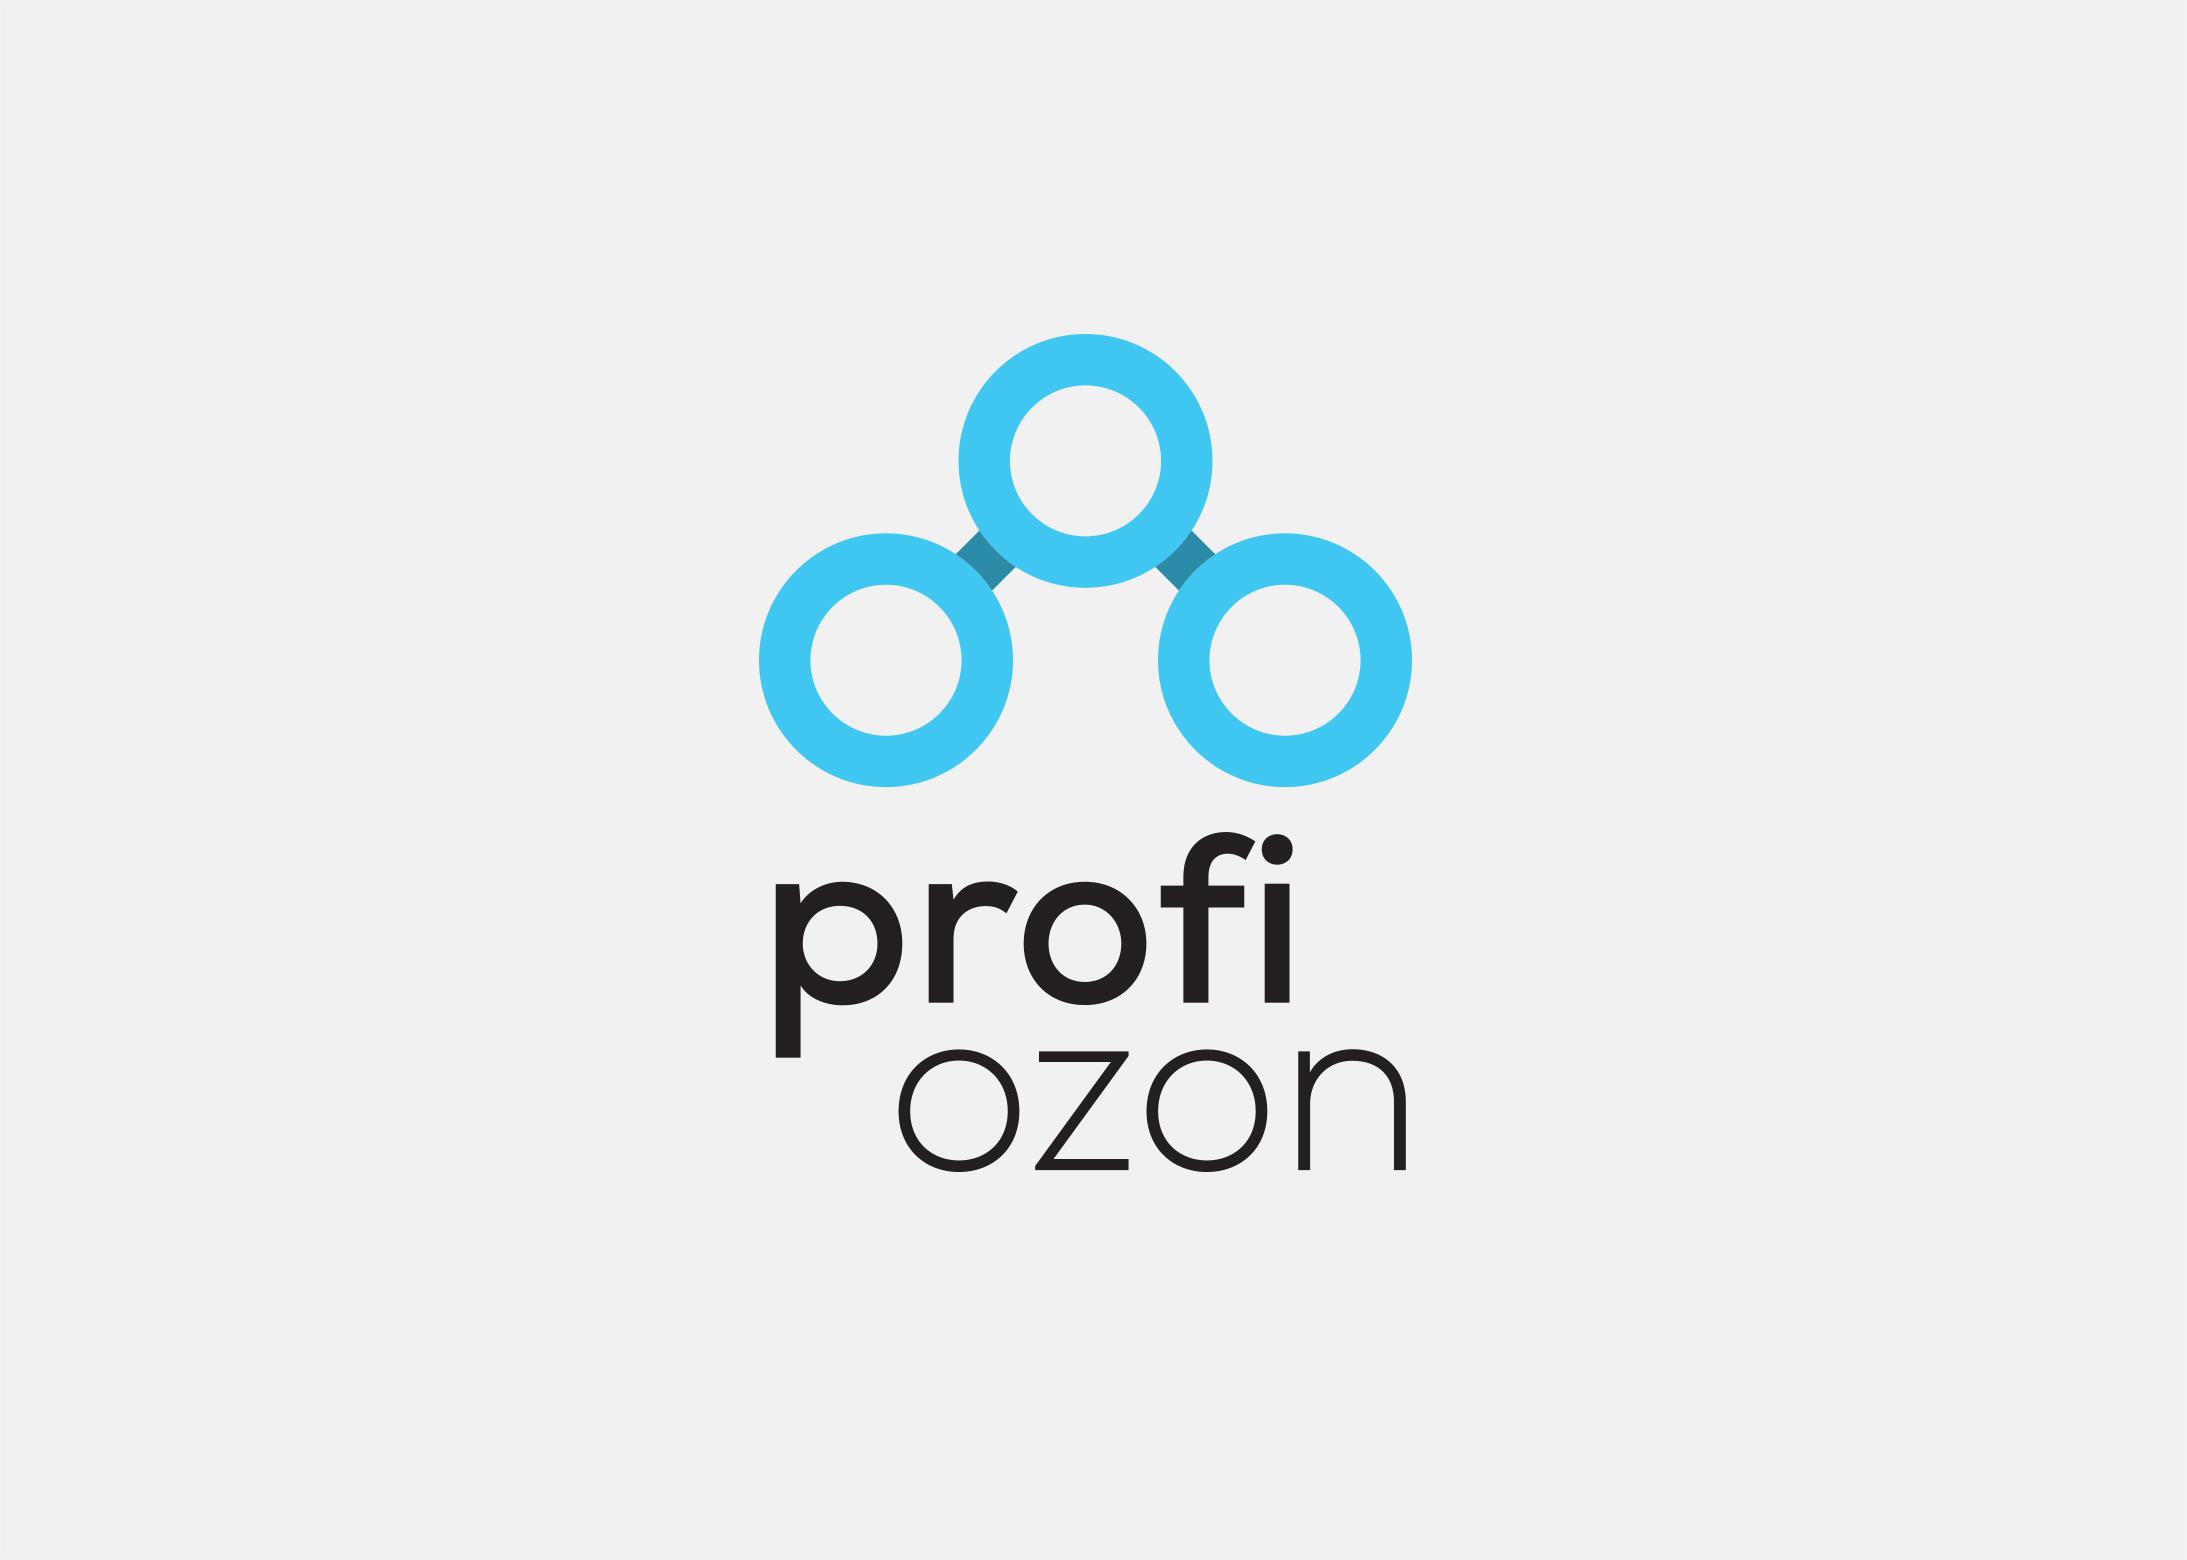 profiozon-logo